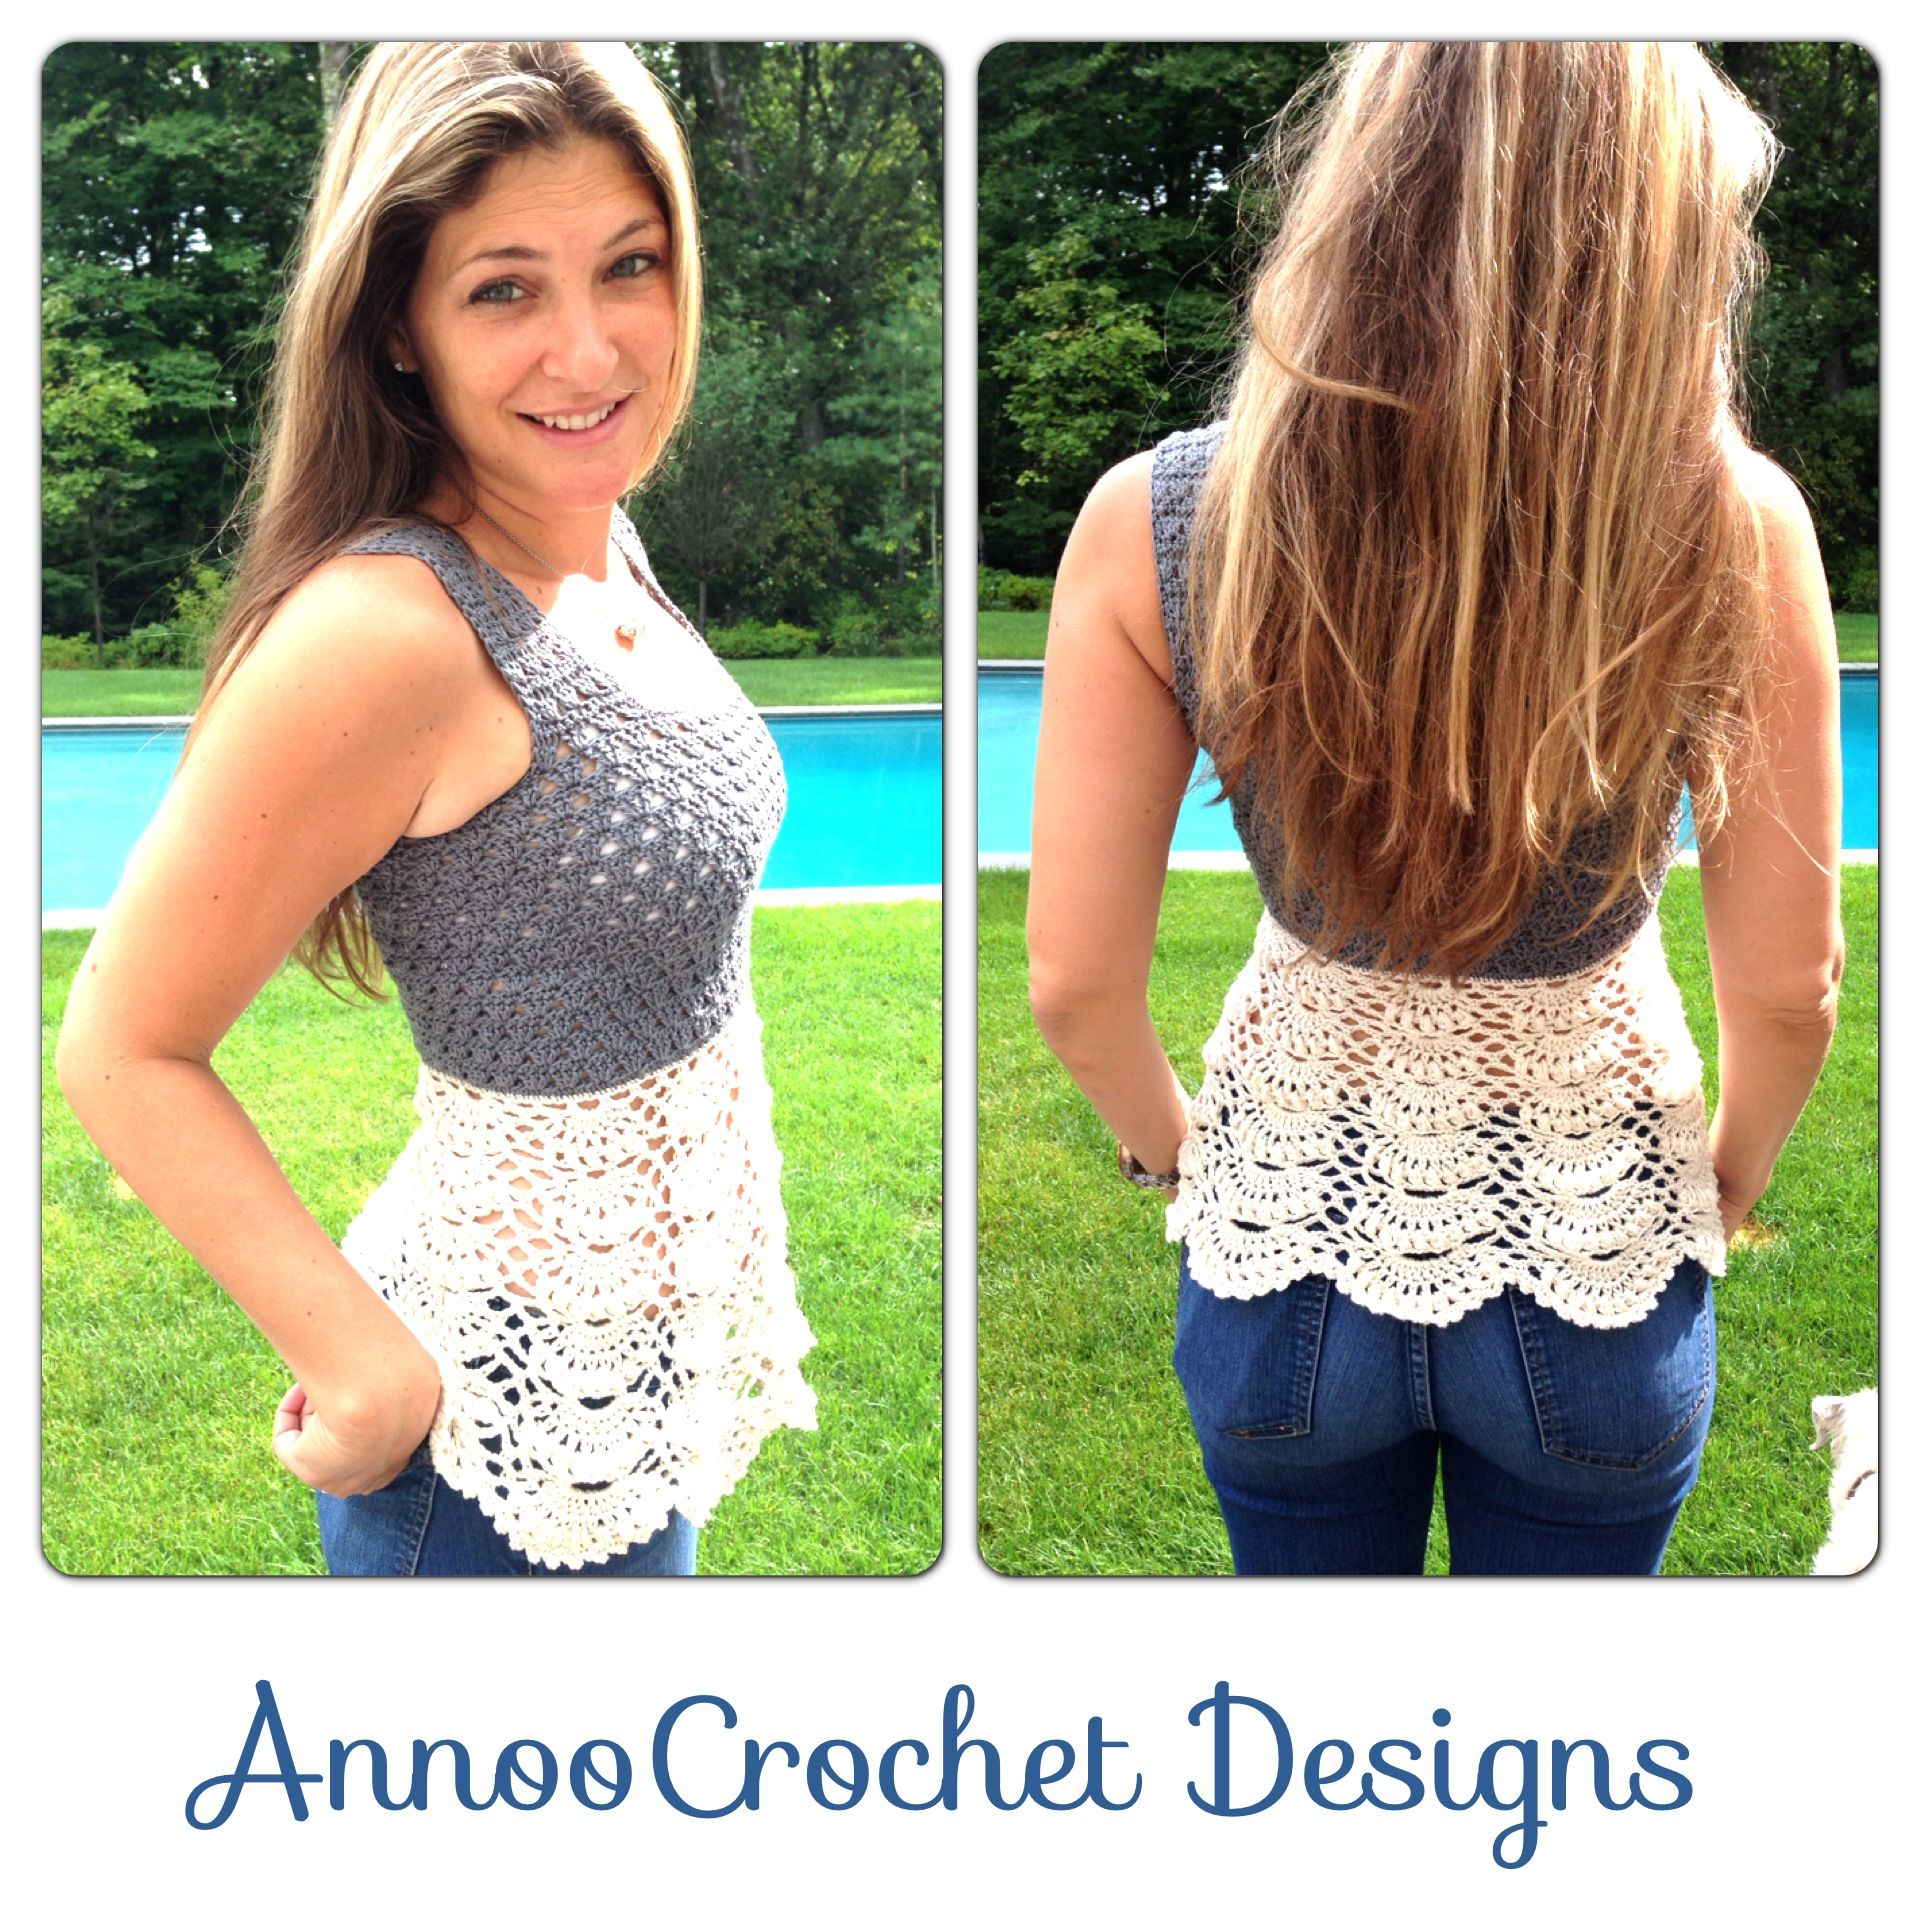 Wonderful diy crochet ballerina top with free pattern free ballerina top free crochet pattern by annoocrochet designs bankloansurffo Gallery